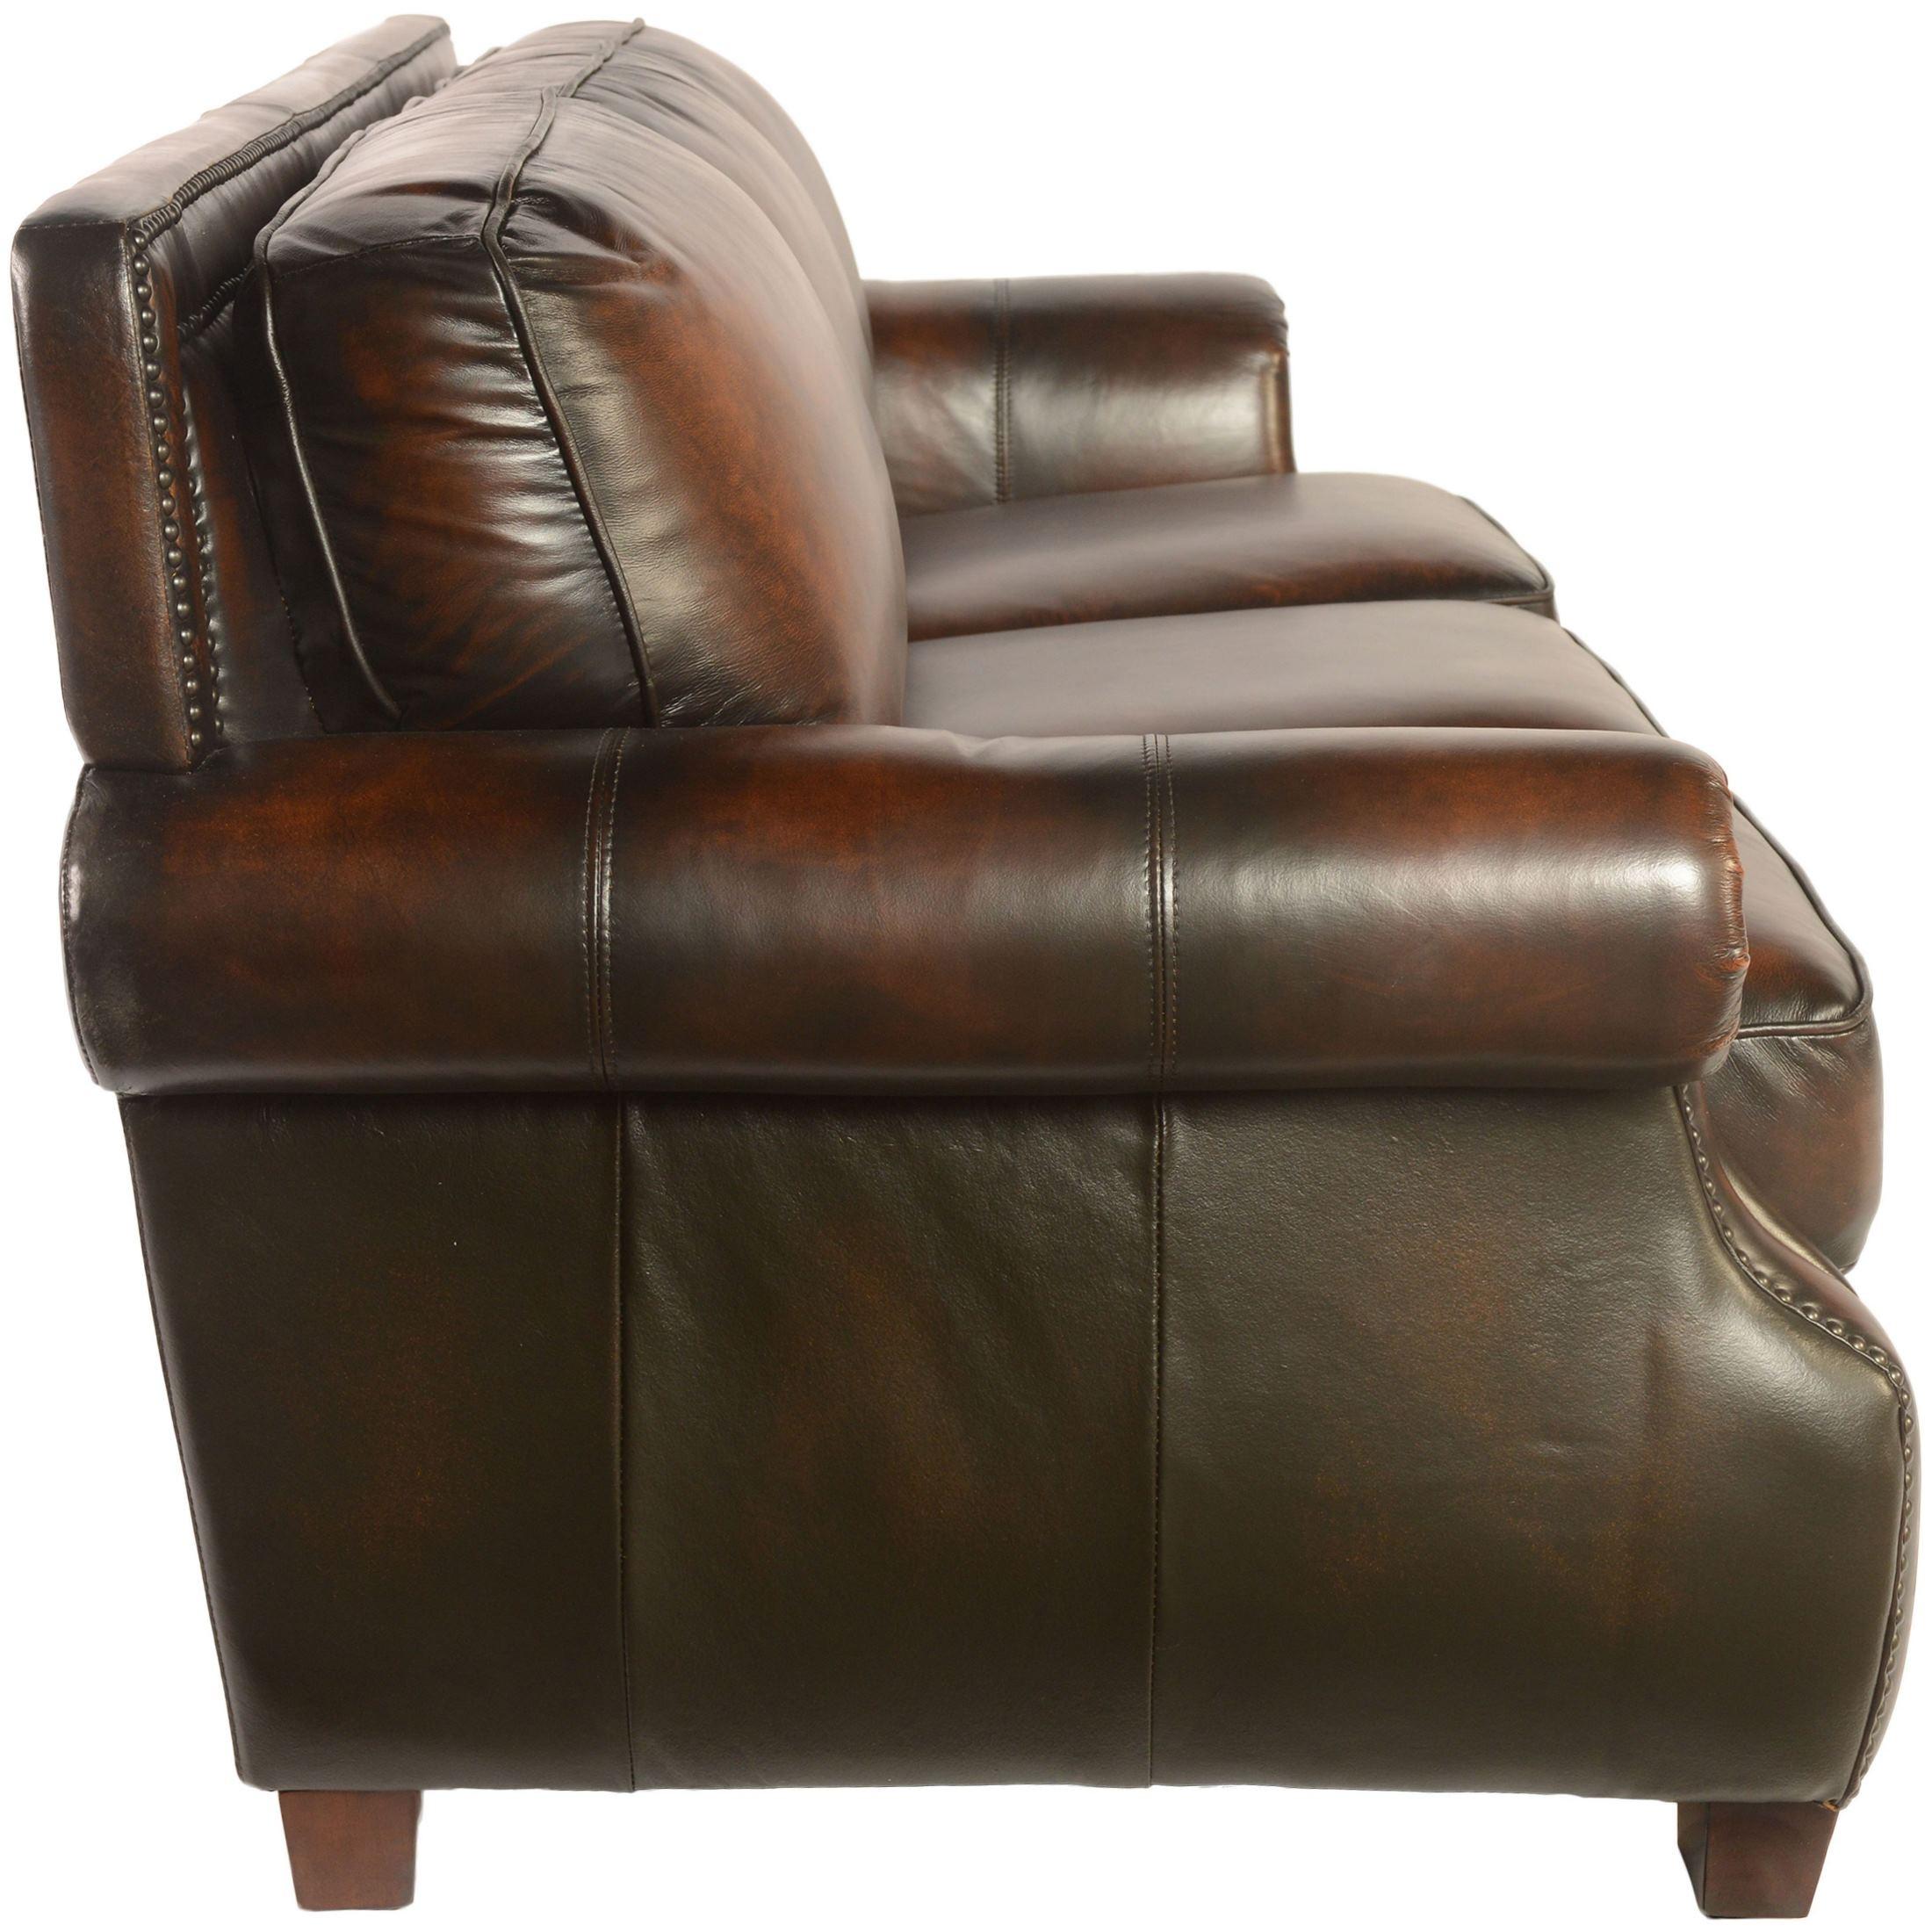 next brompton leather sofa harga bed 3 in 1 prato cocoa wh 5070 30 9021 lazzaro